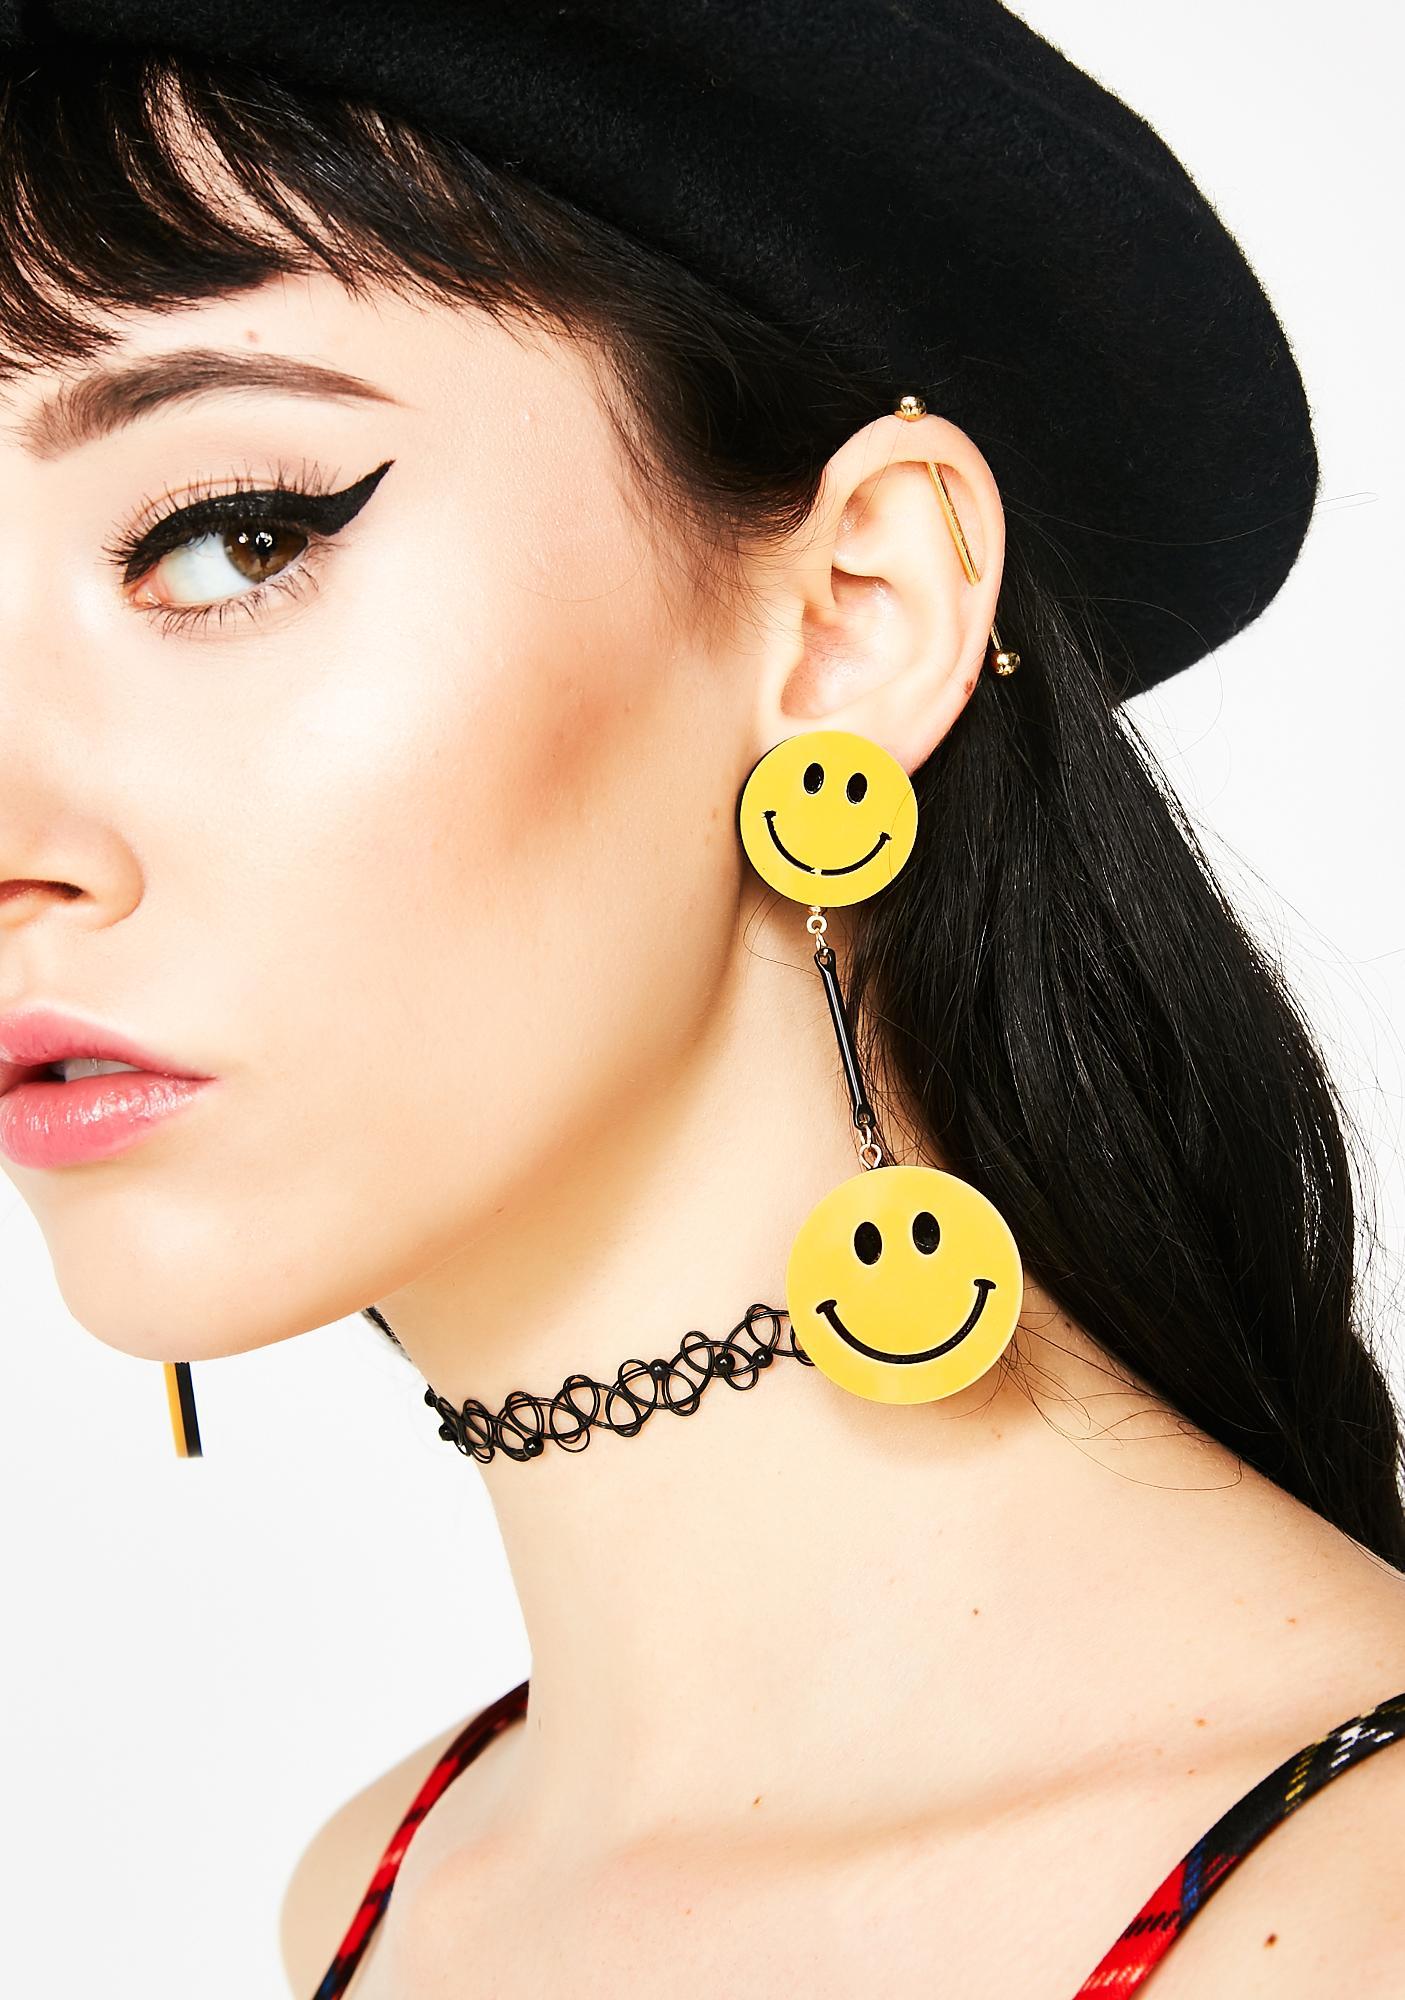 Call Me Smiley Face Earrings